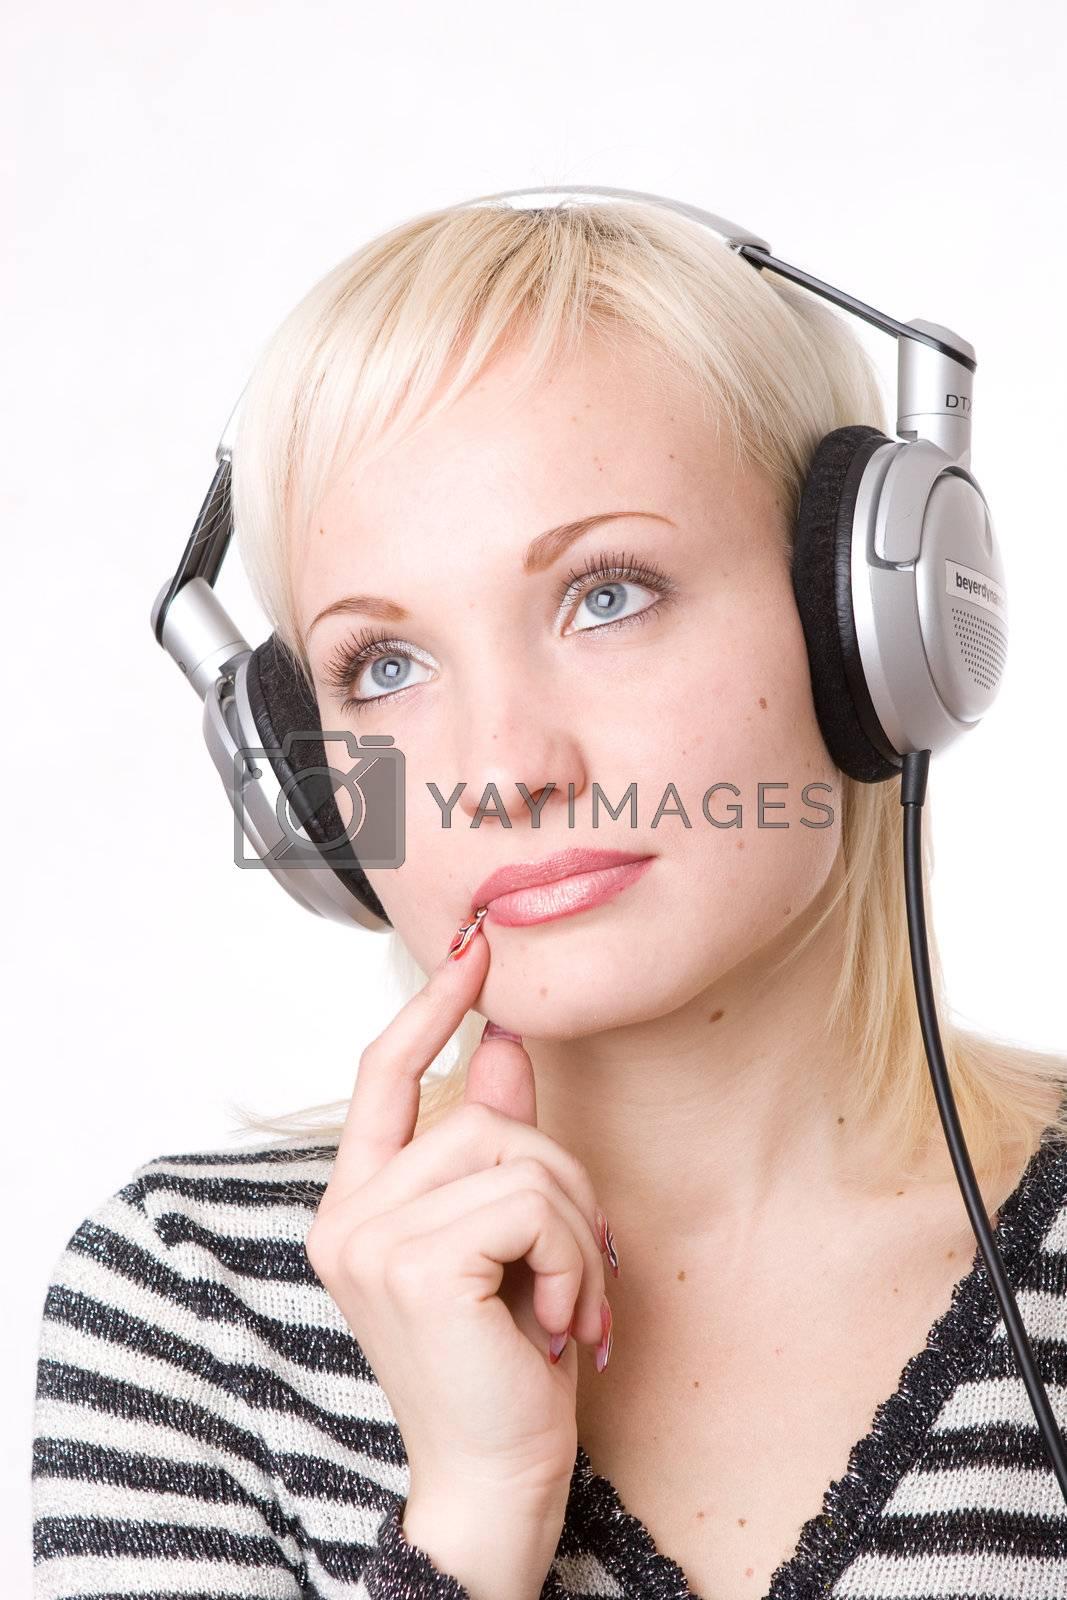 a pensive girl in headphones listening music